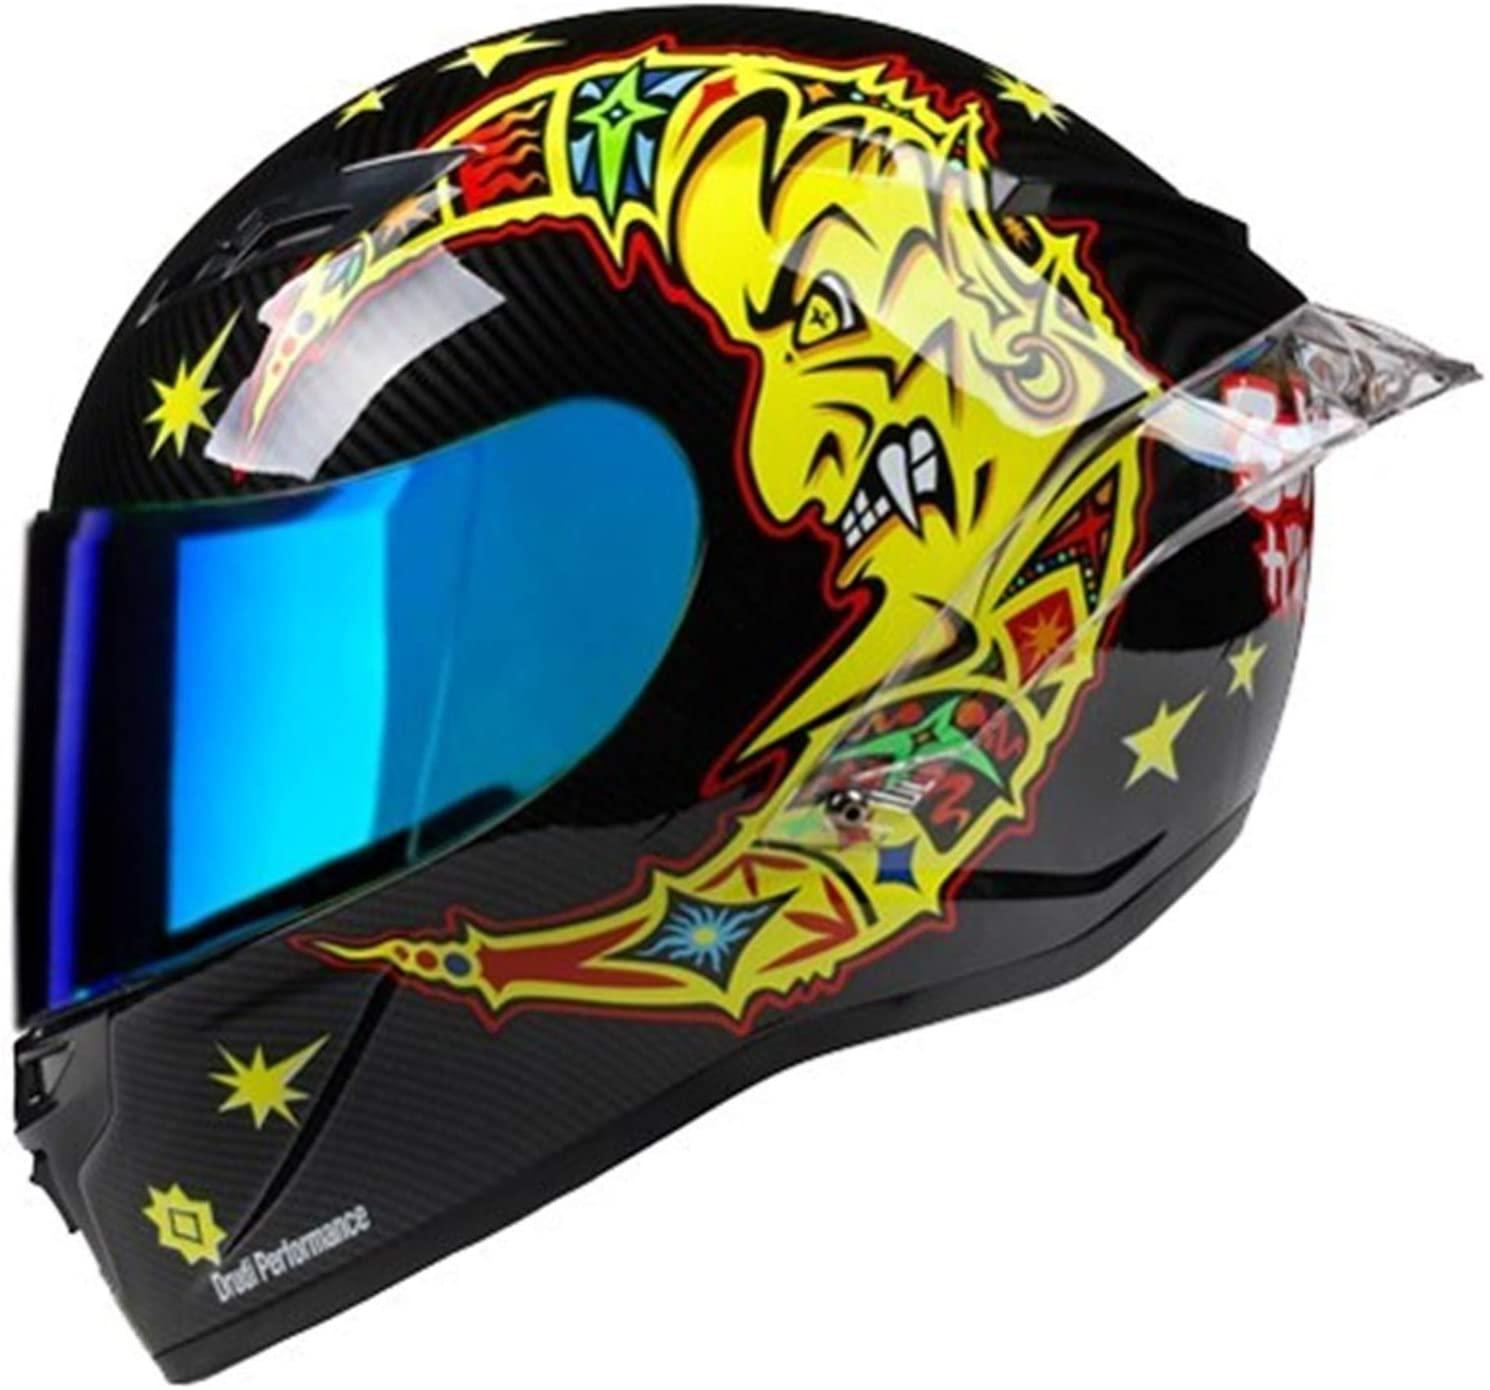 Durable Motorbike Helmet, Full Helmet Atv Helmet Dot Approved Off-road Racing Race Helmet, for Mopeds and Off-road Vehicles Lightweight (Color : 3, Size : XL)